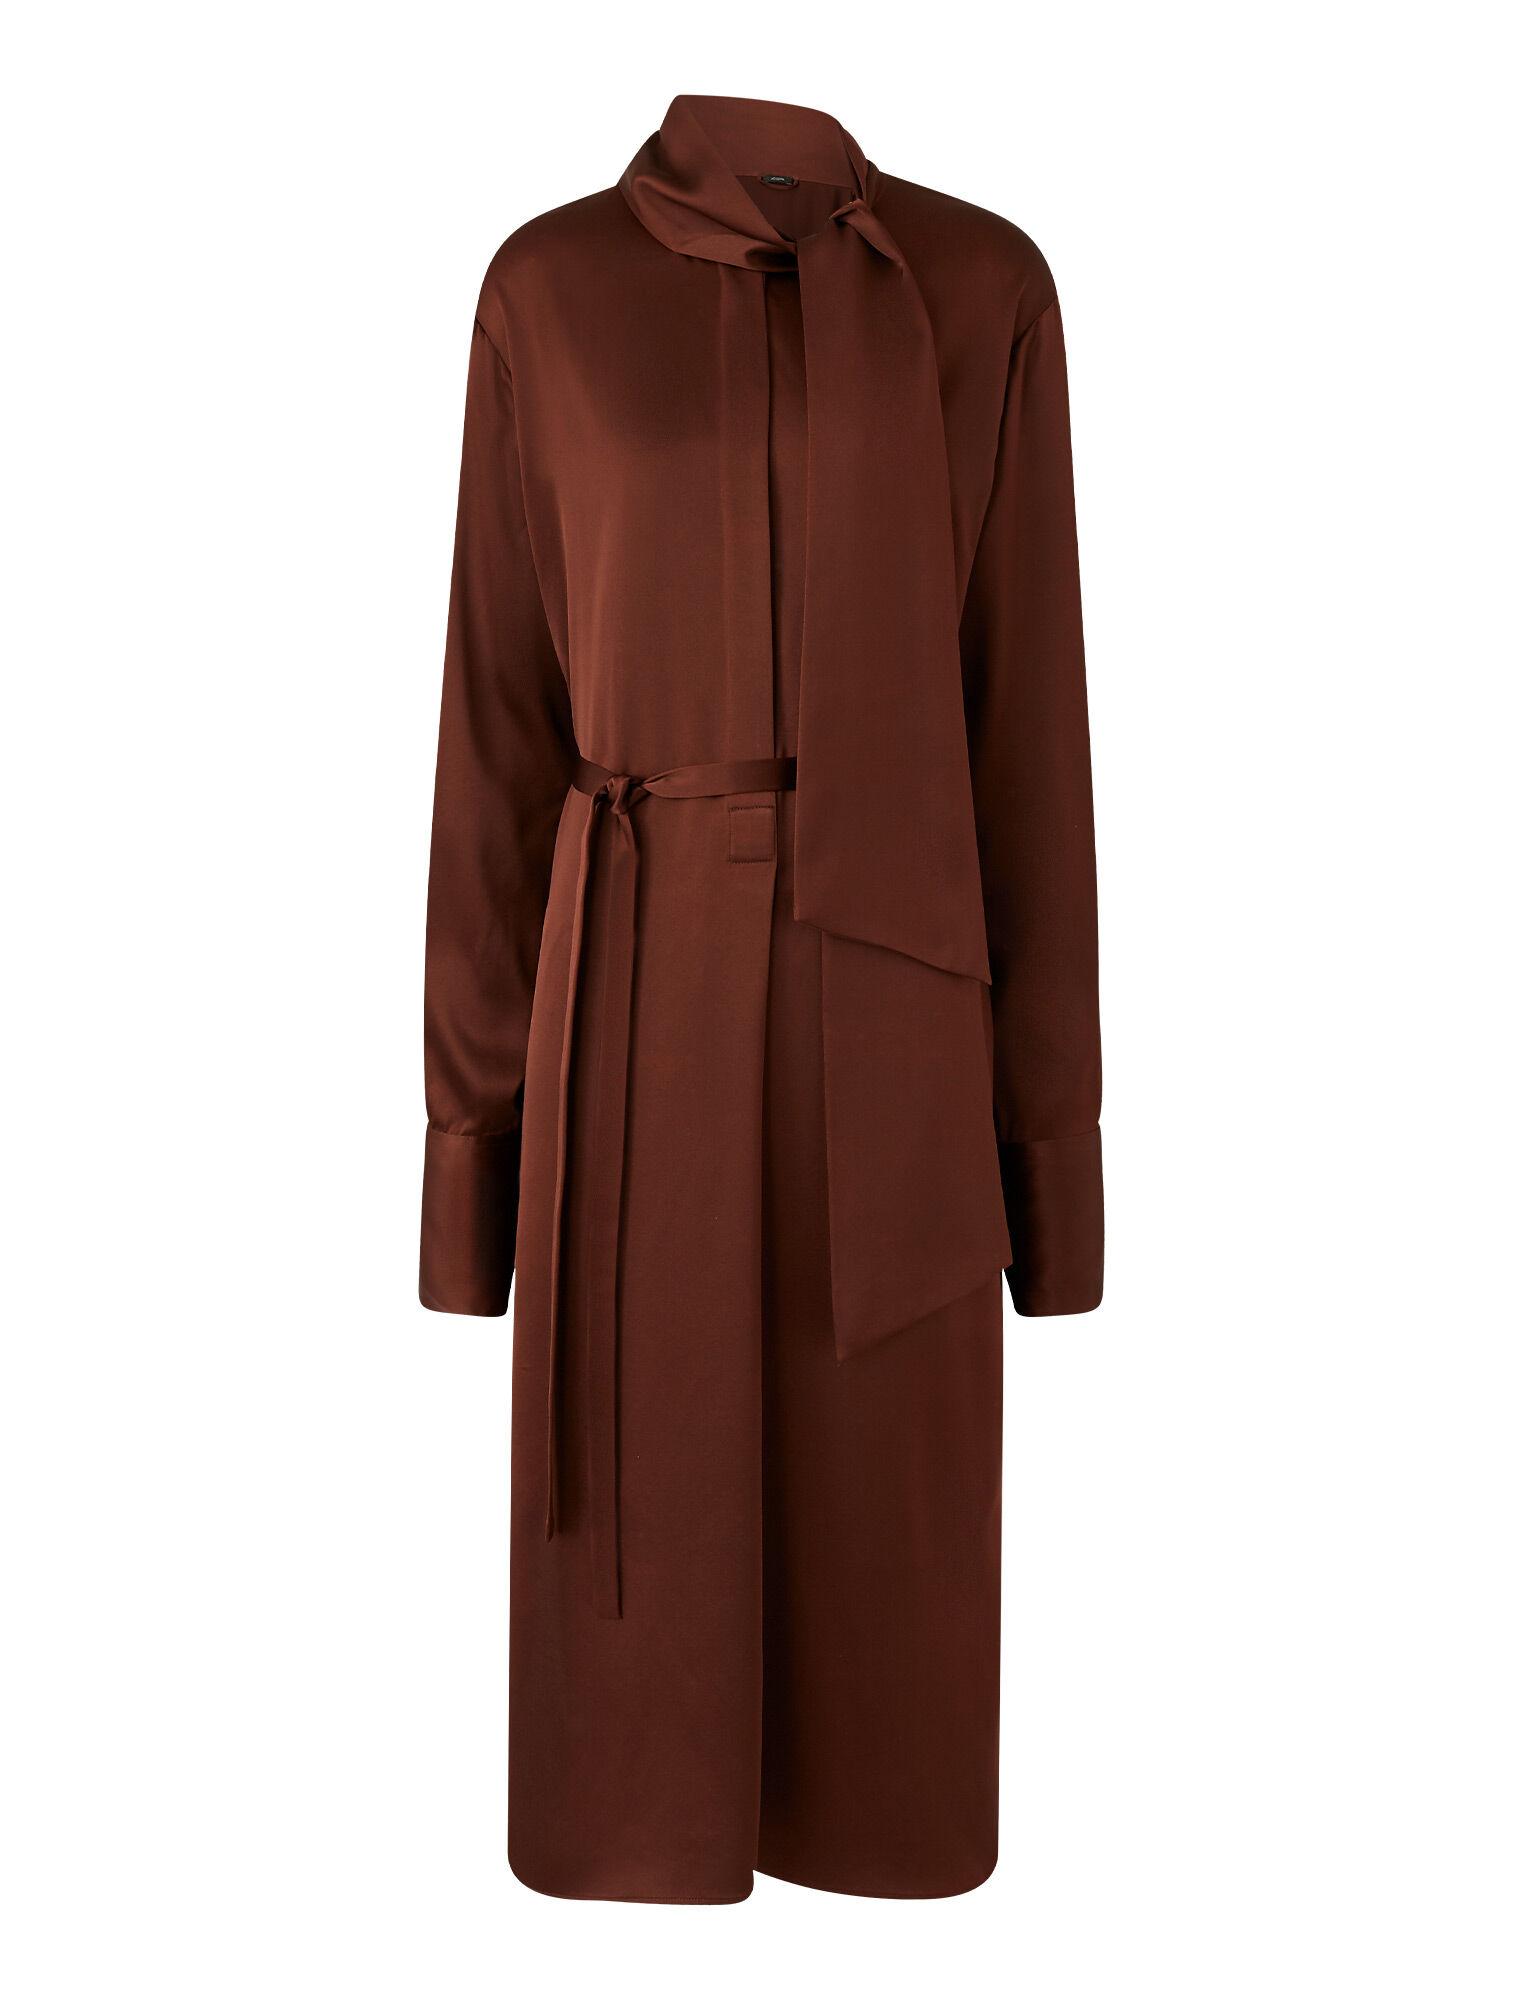 JOSEPH Silks JOSEPH SILK SATIN DORIANE DRESS